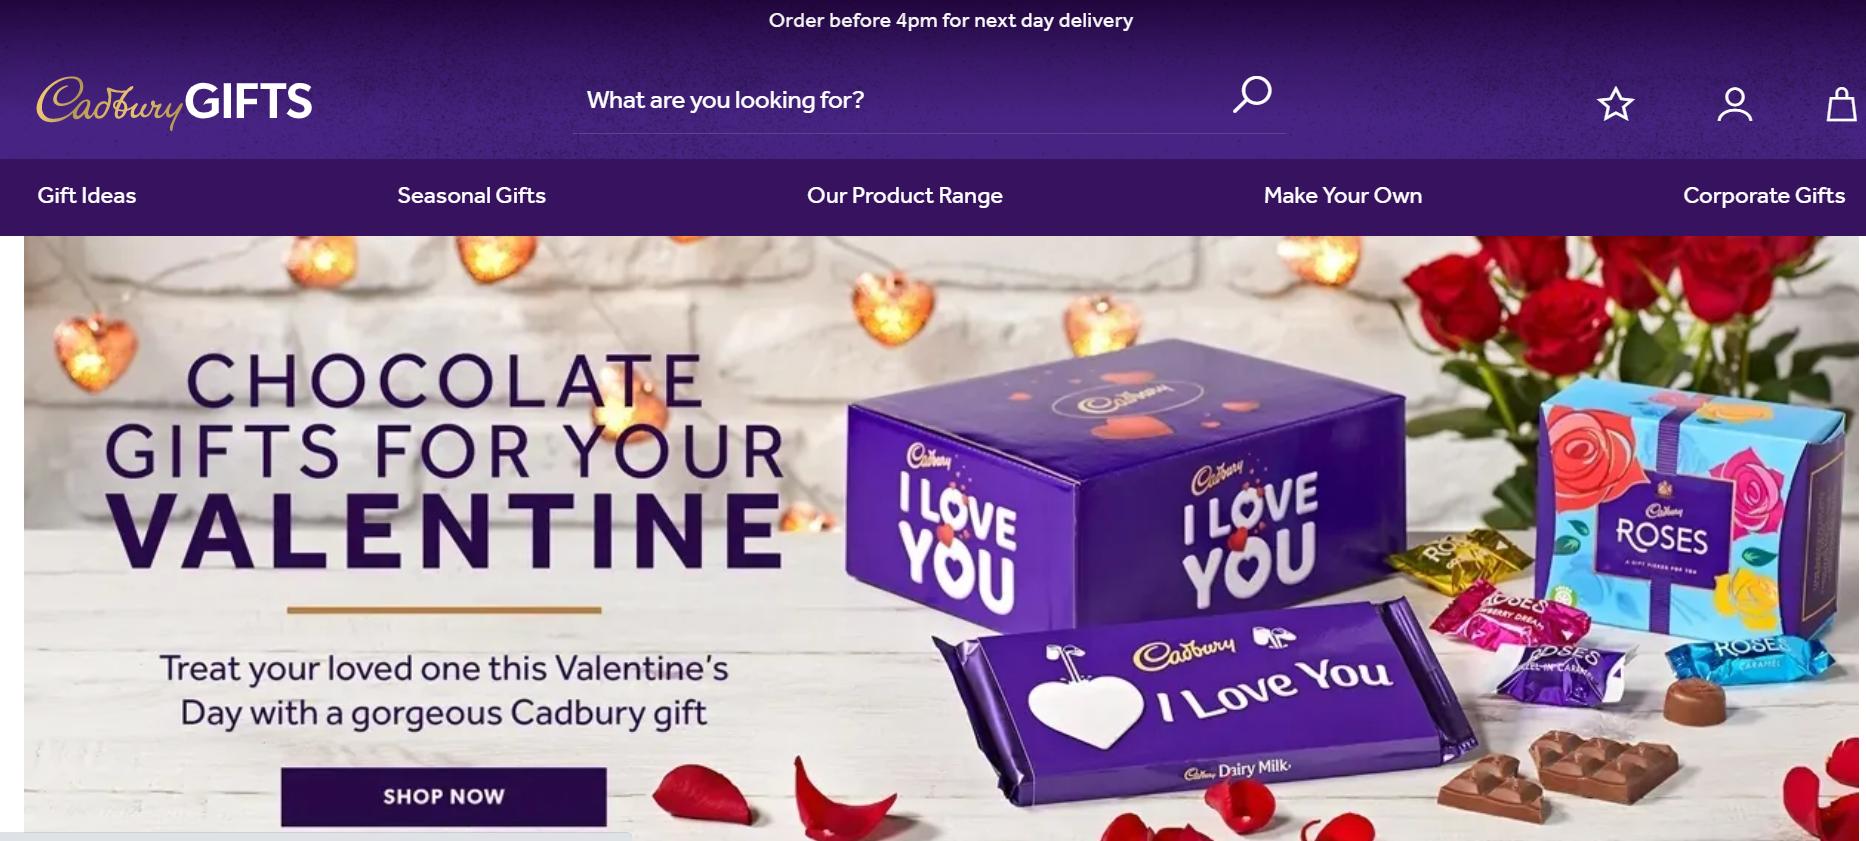 Cadbury eCommerce branding website example